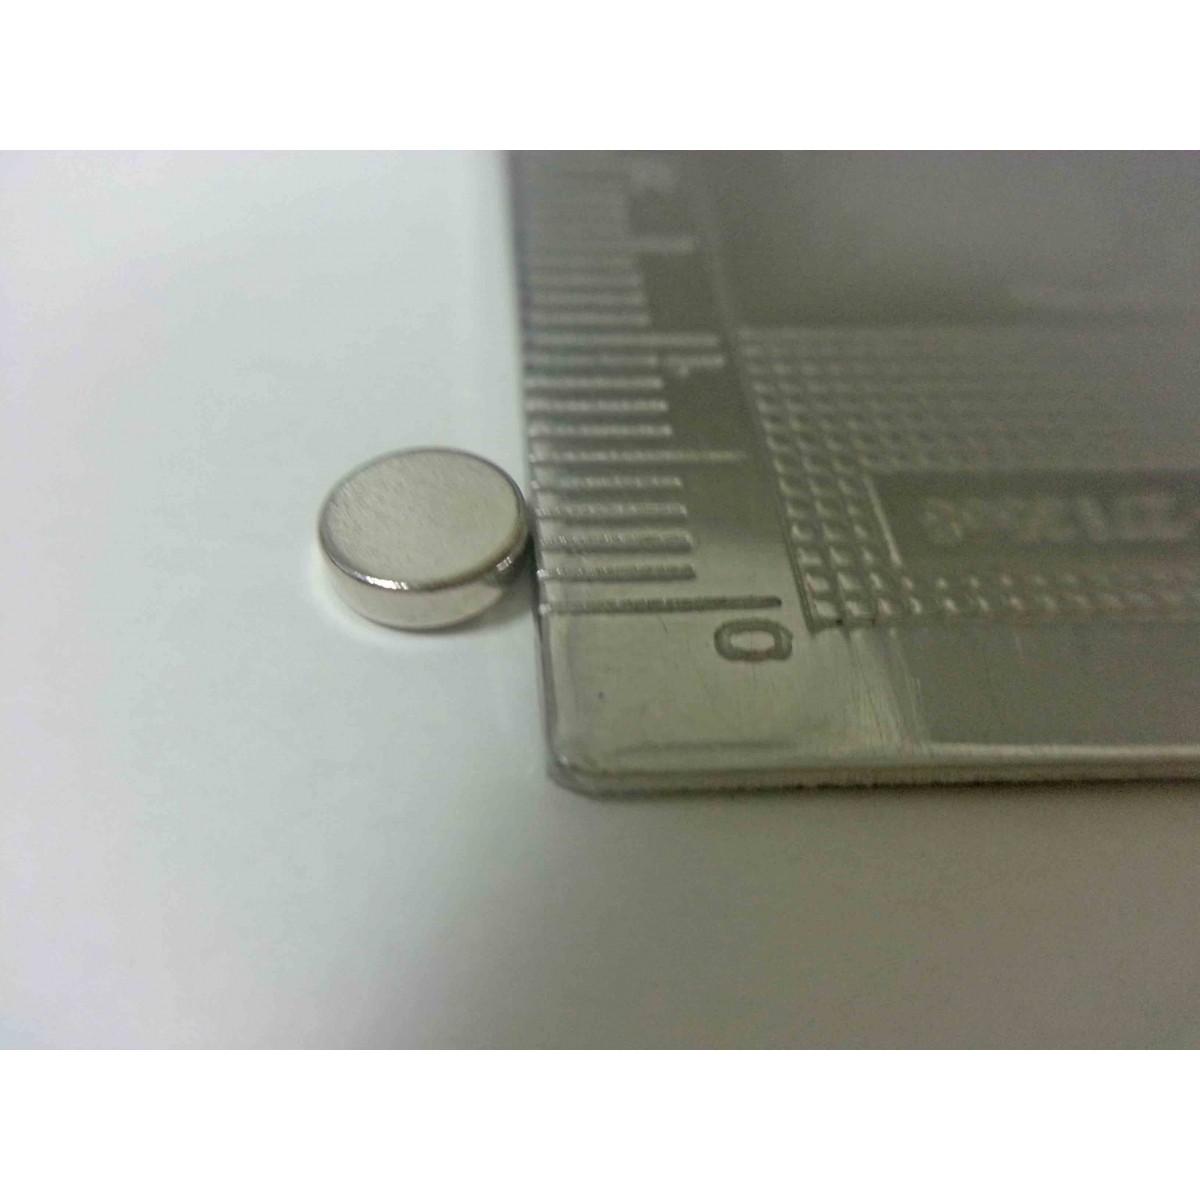 Ima De Neodímio / Super Forte / 5mm X 1,5mm - 100 Peças